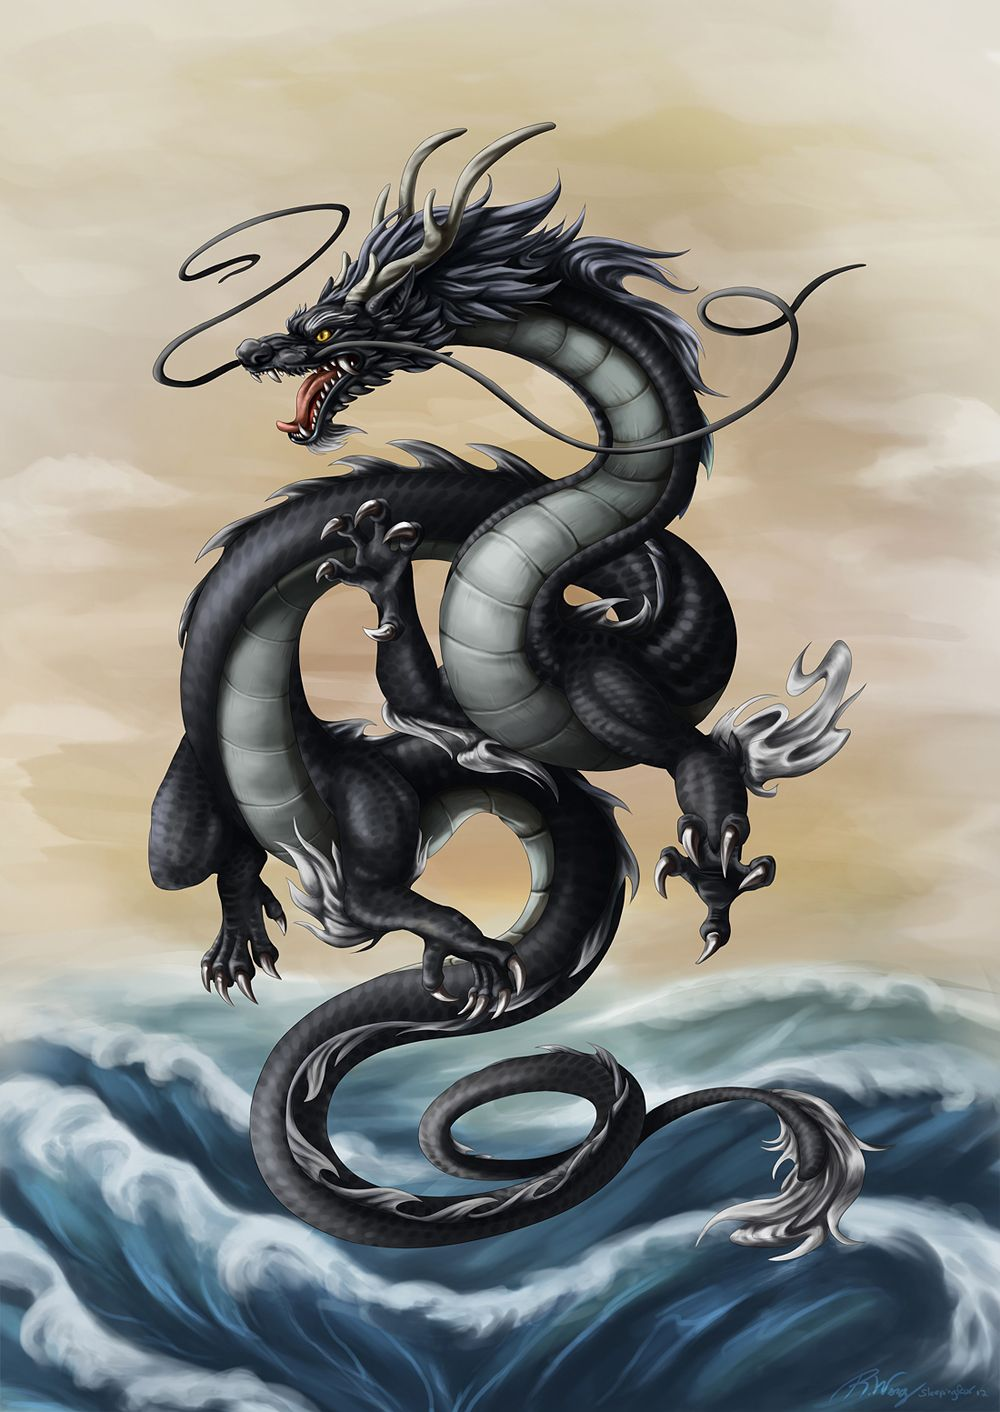 http://sleepingfox.deviantart.com/art/Year-of-the-Black-Water-Dragon-2012-282614740?offset=0